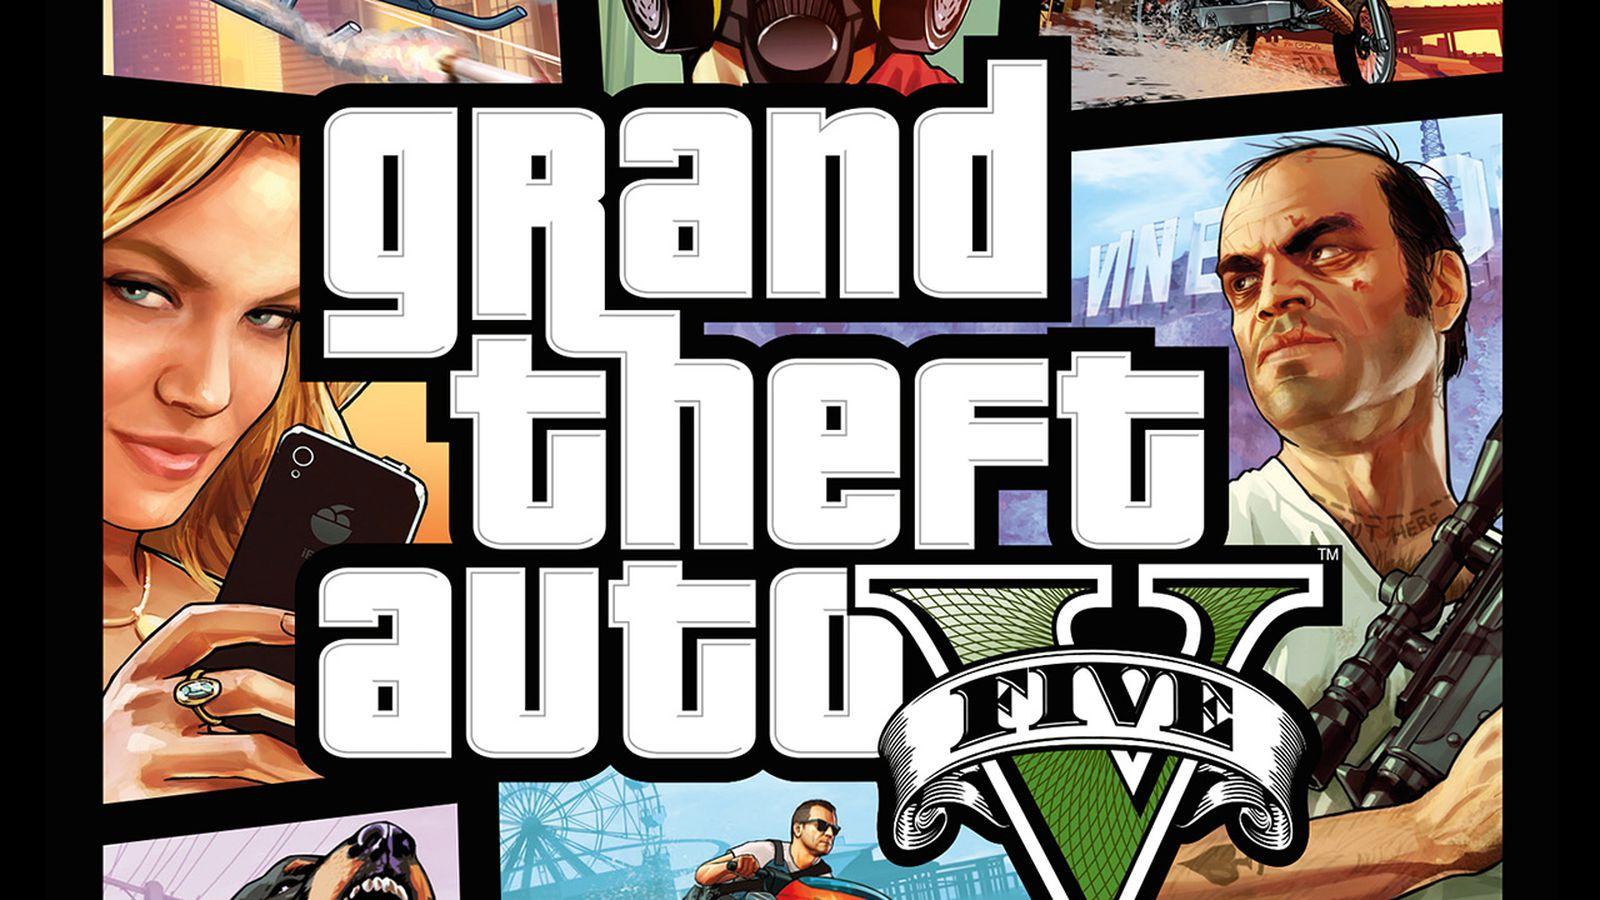 Gta 6 Cover: Grand Theft Auto 5 Cover Art Follows The Series' Blueprint